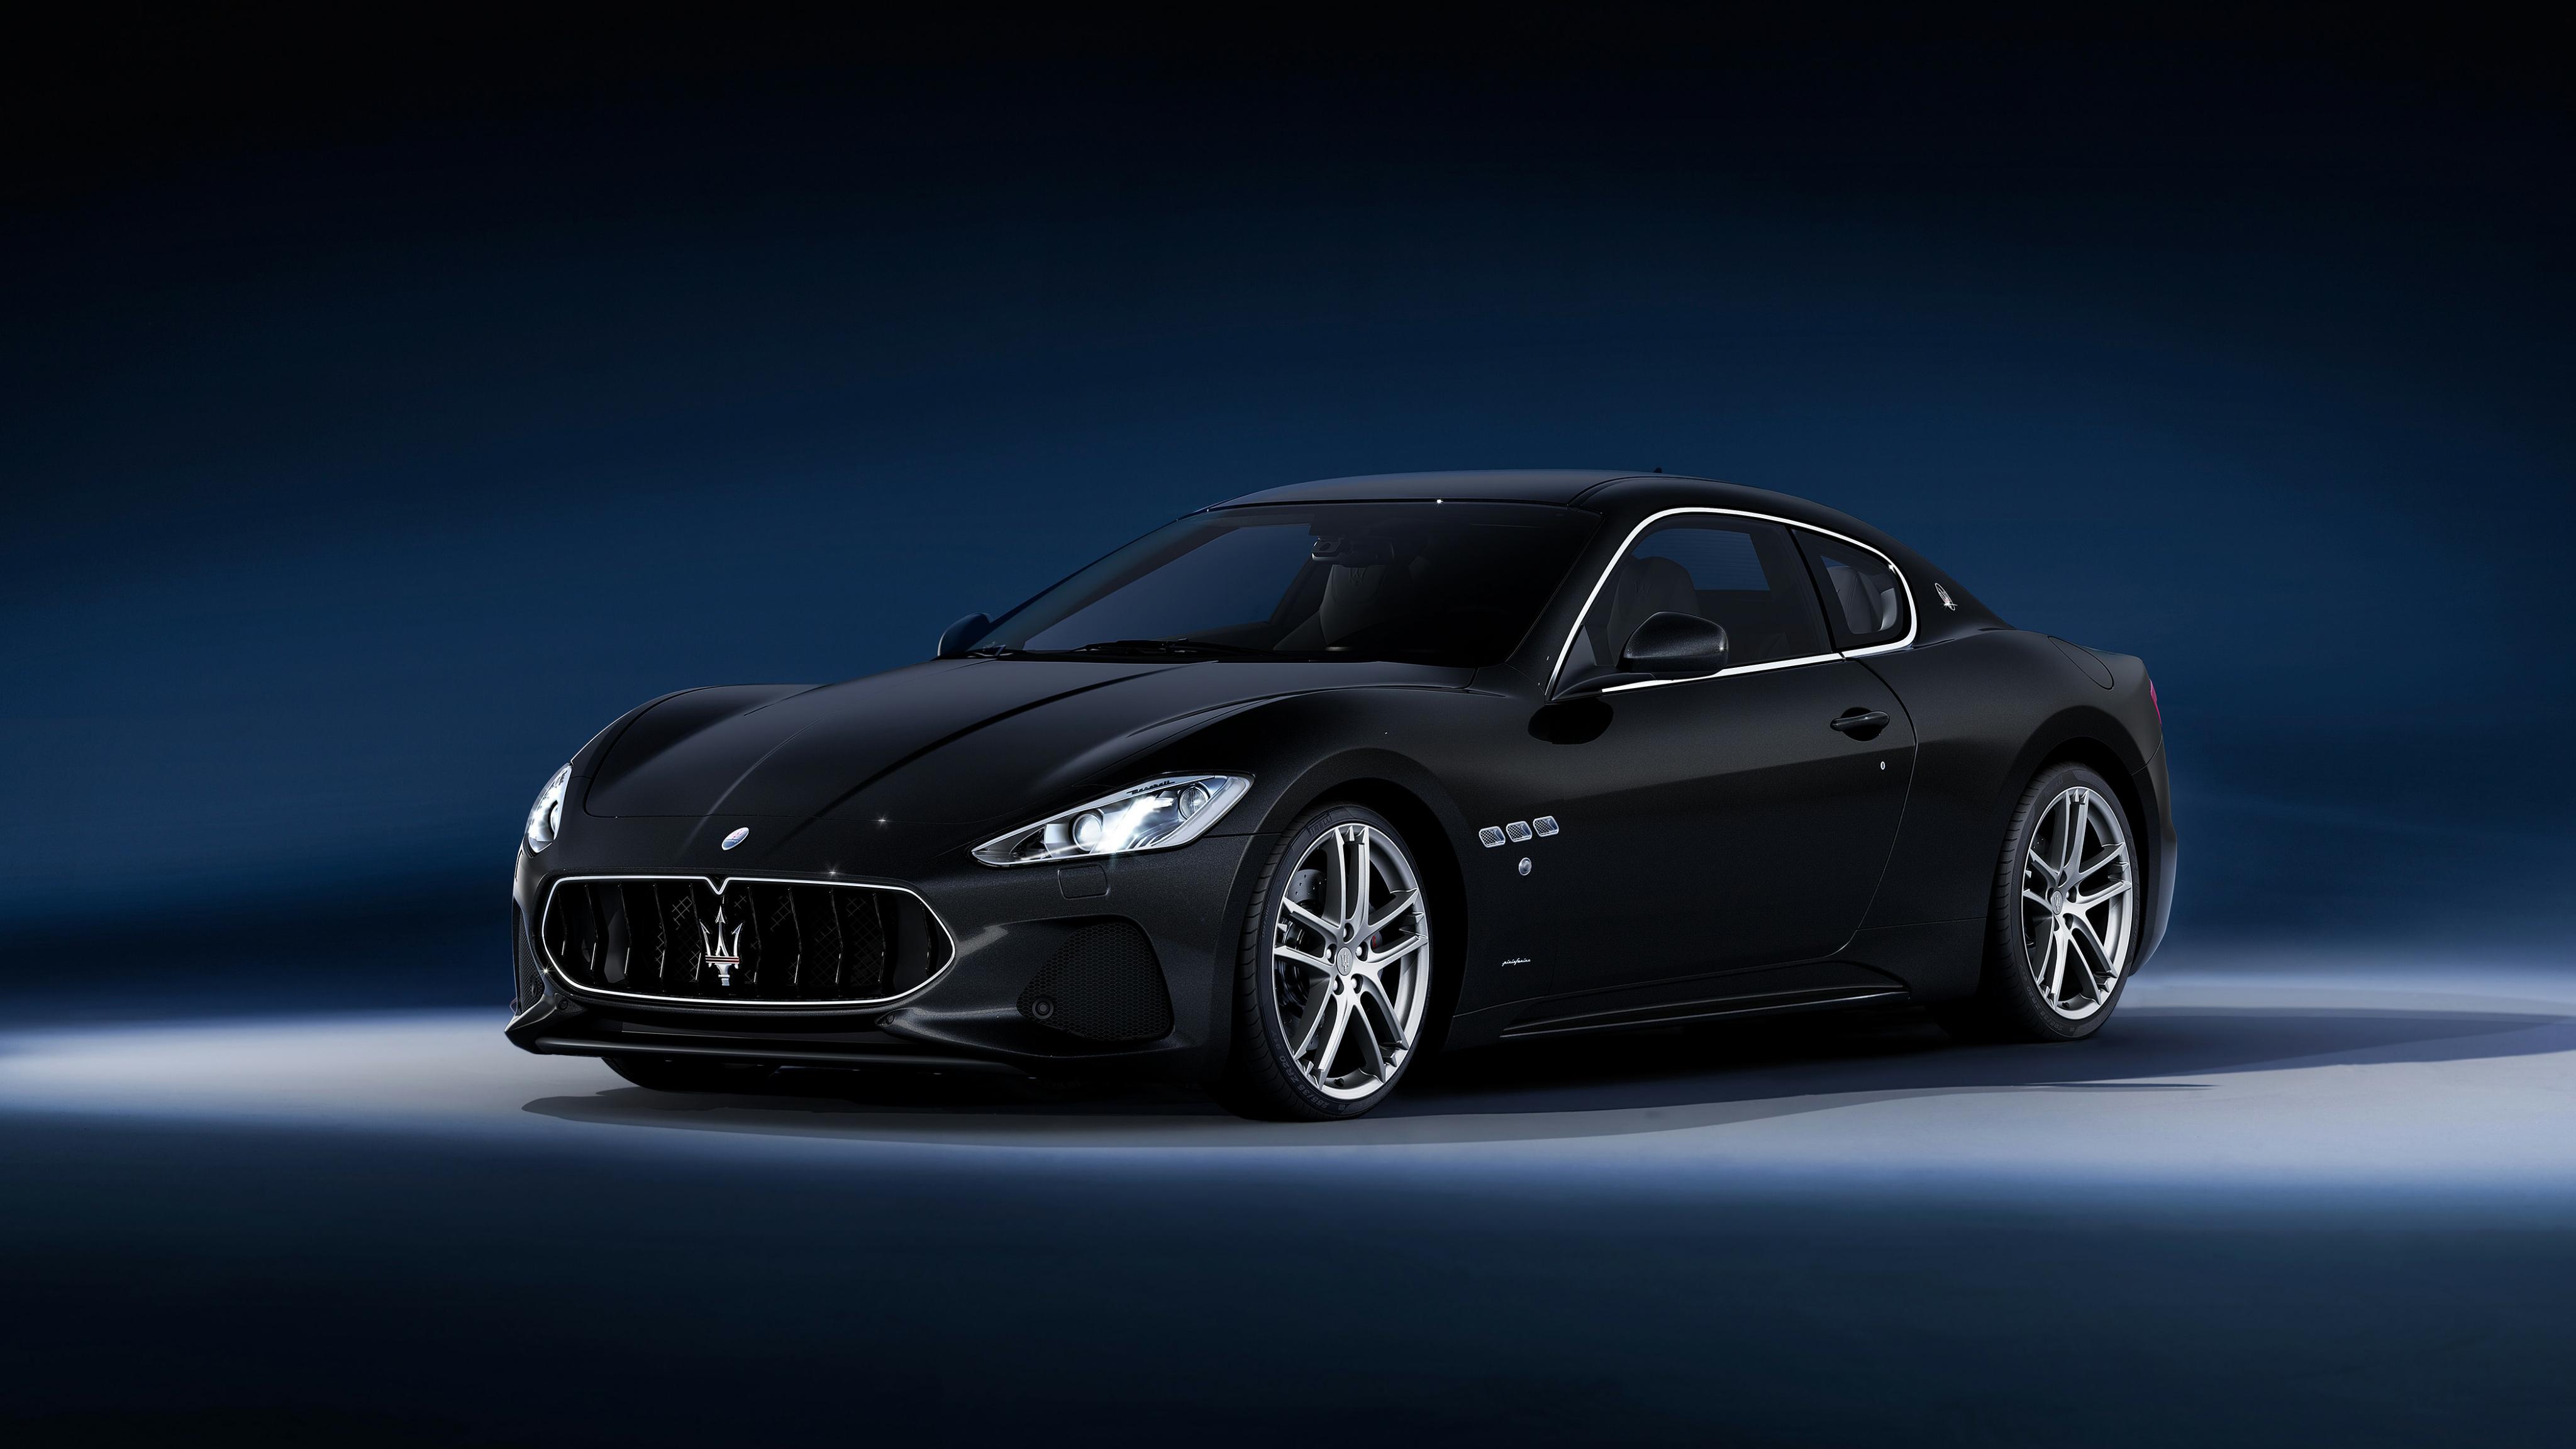 Maserati GranTurismo 2018 Wallpaper HD Car Wallpapers ID 7905 4096x2304